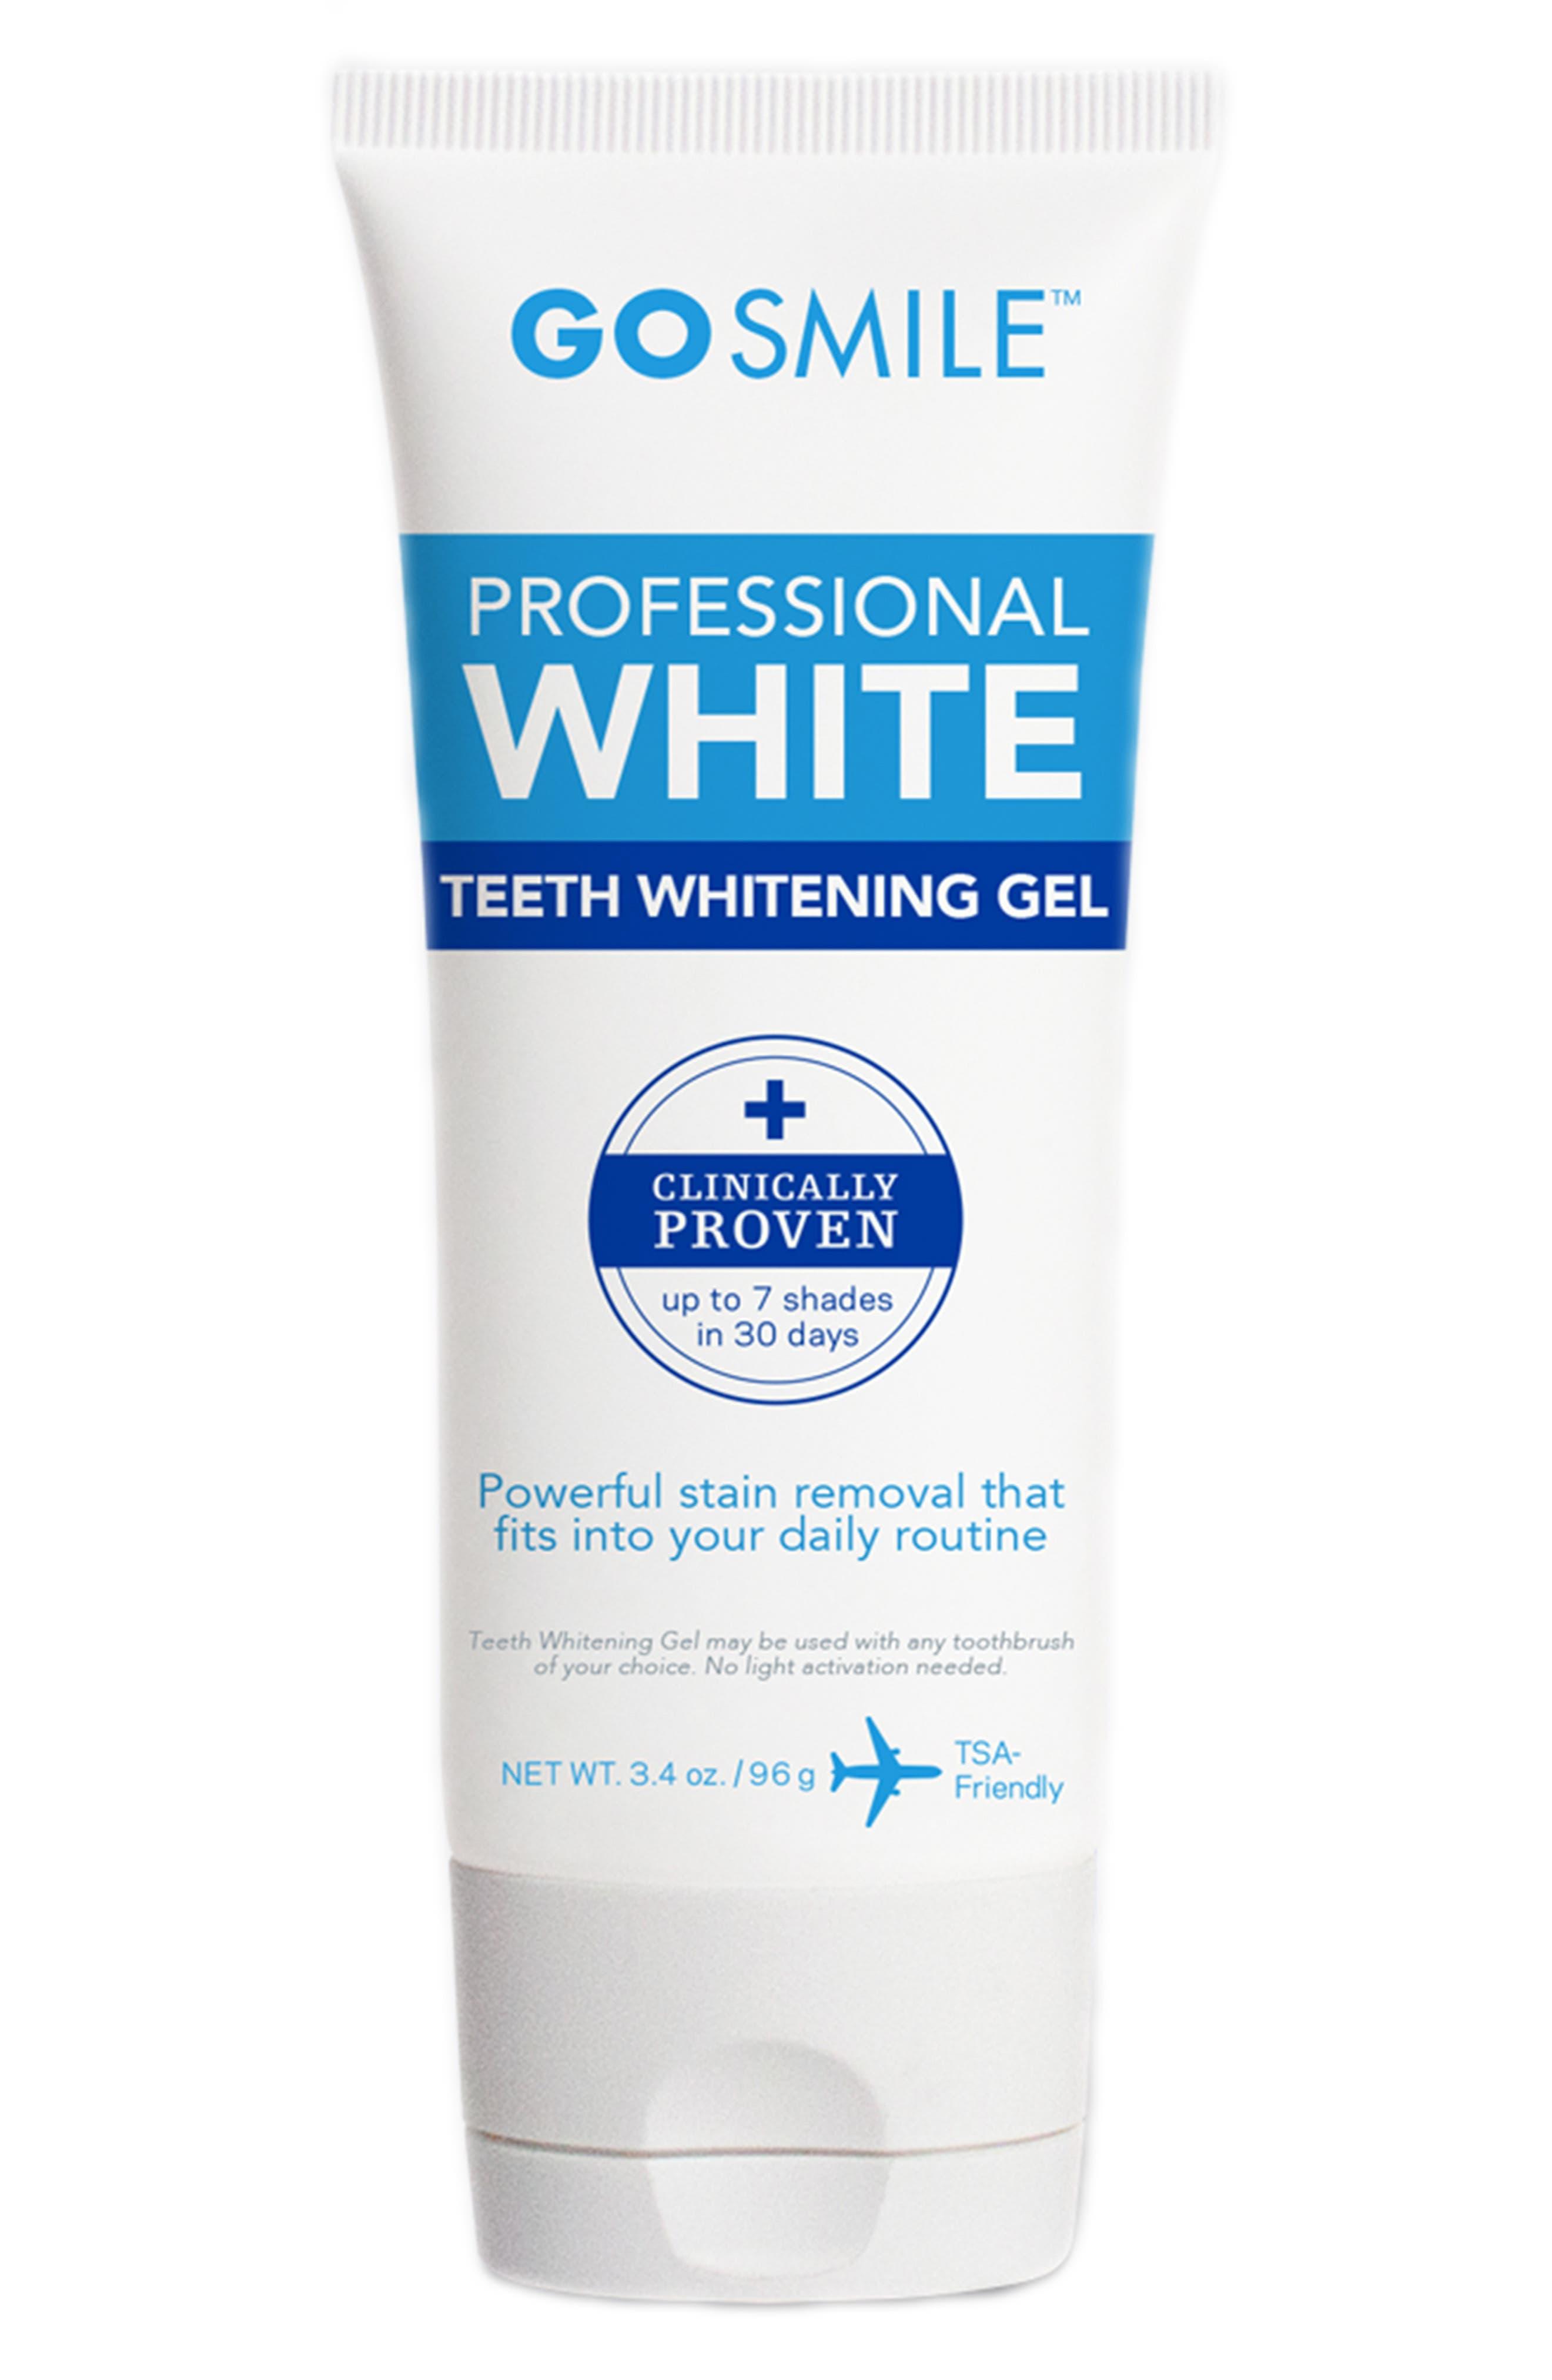 GO SMiLE(R) Teeth Whitening Gel at Nordstrom